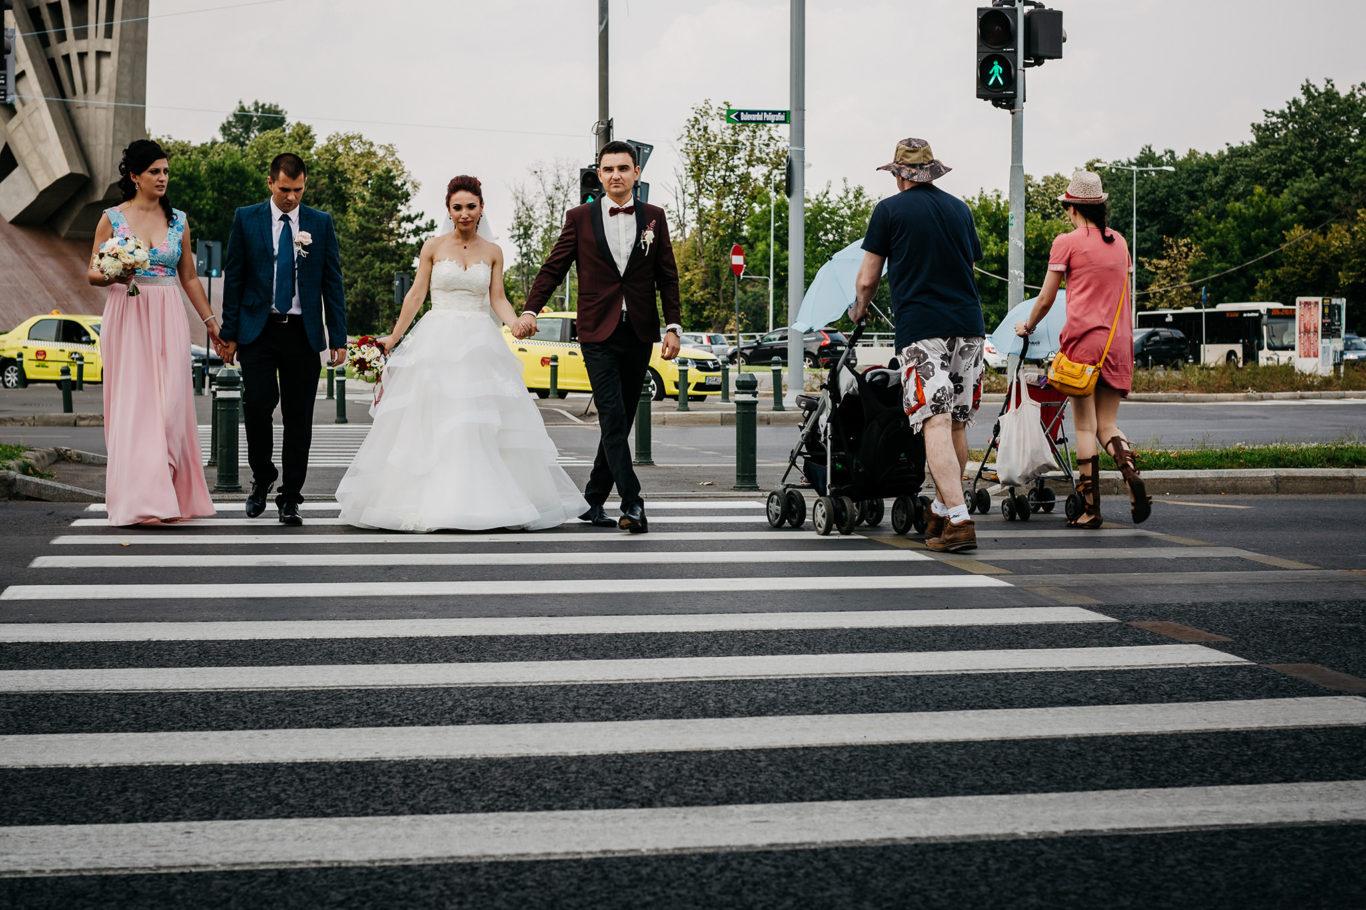 0312-fotografie-nunta-bucuresti-cristina-nicusor-fotograf-ciprian-dumitrescu-cd2_0308